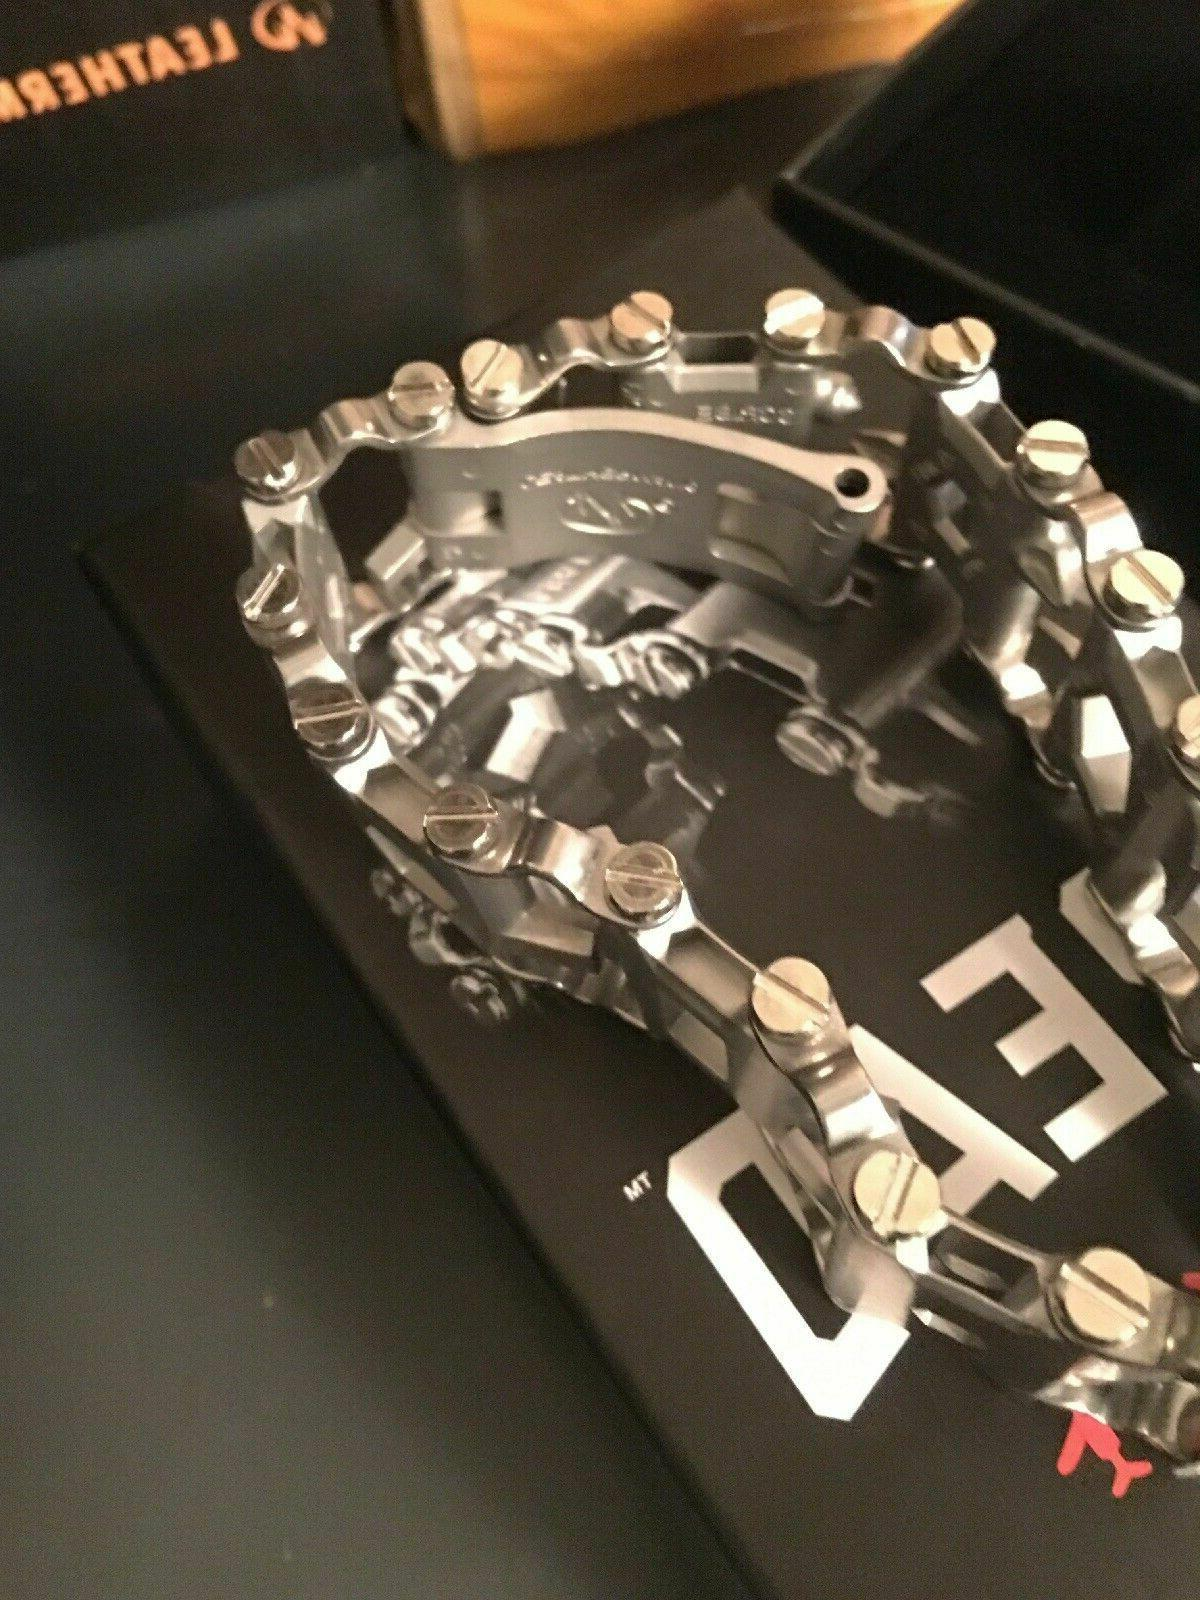 Leatherman Stainless Steel Tool w